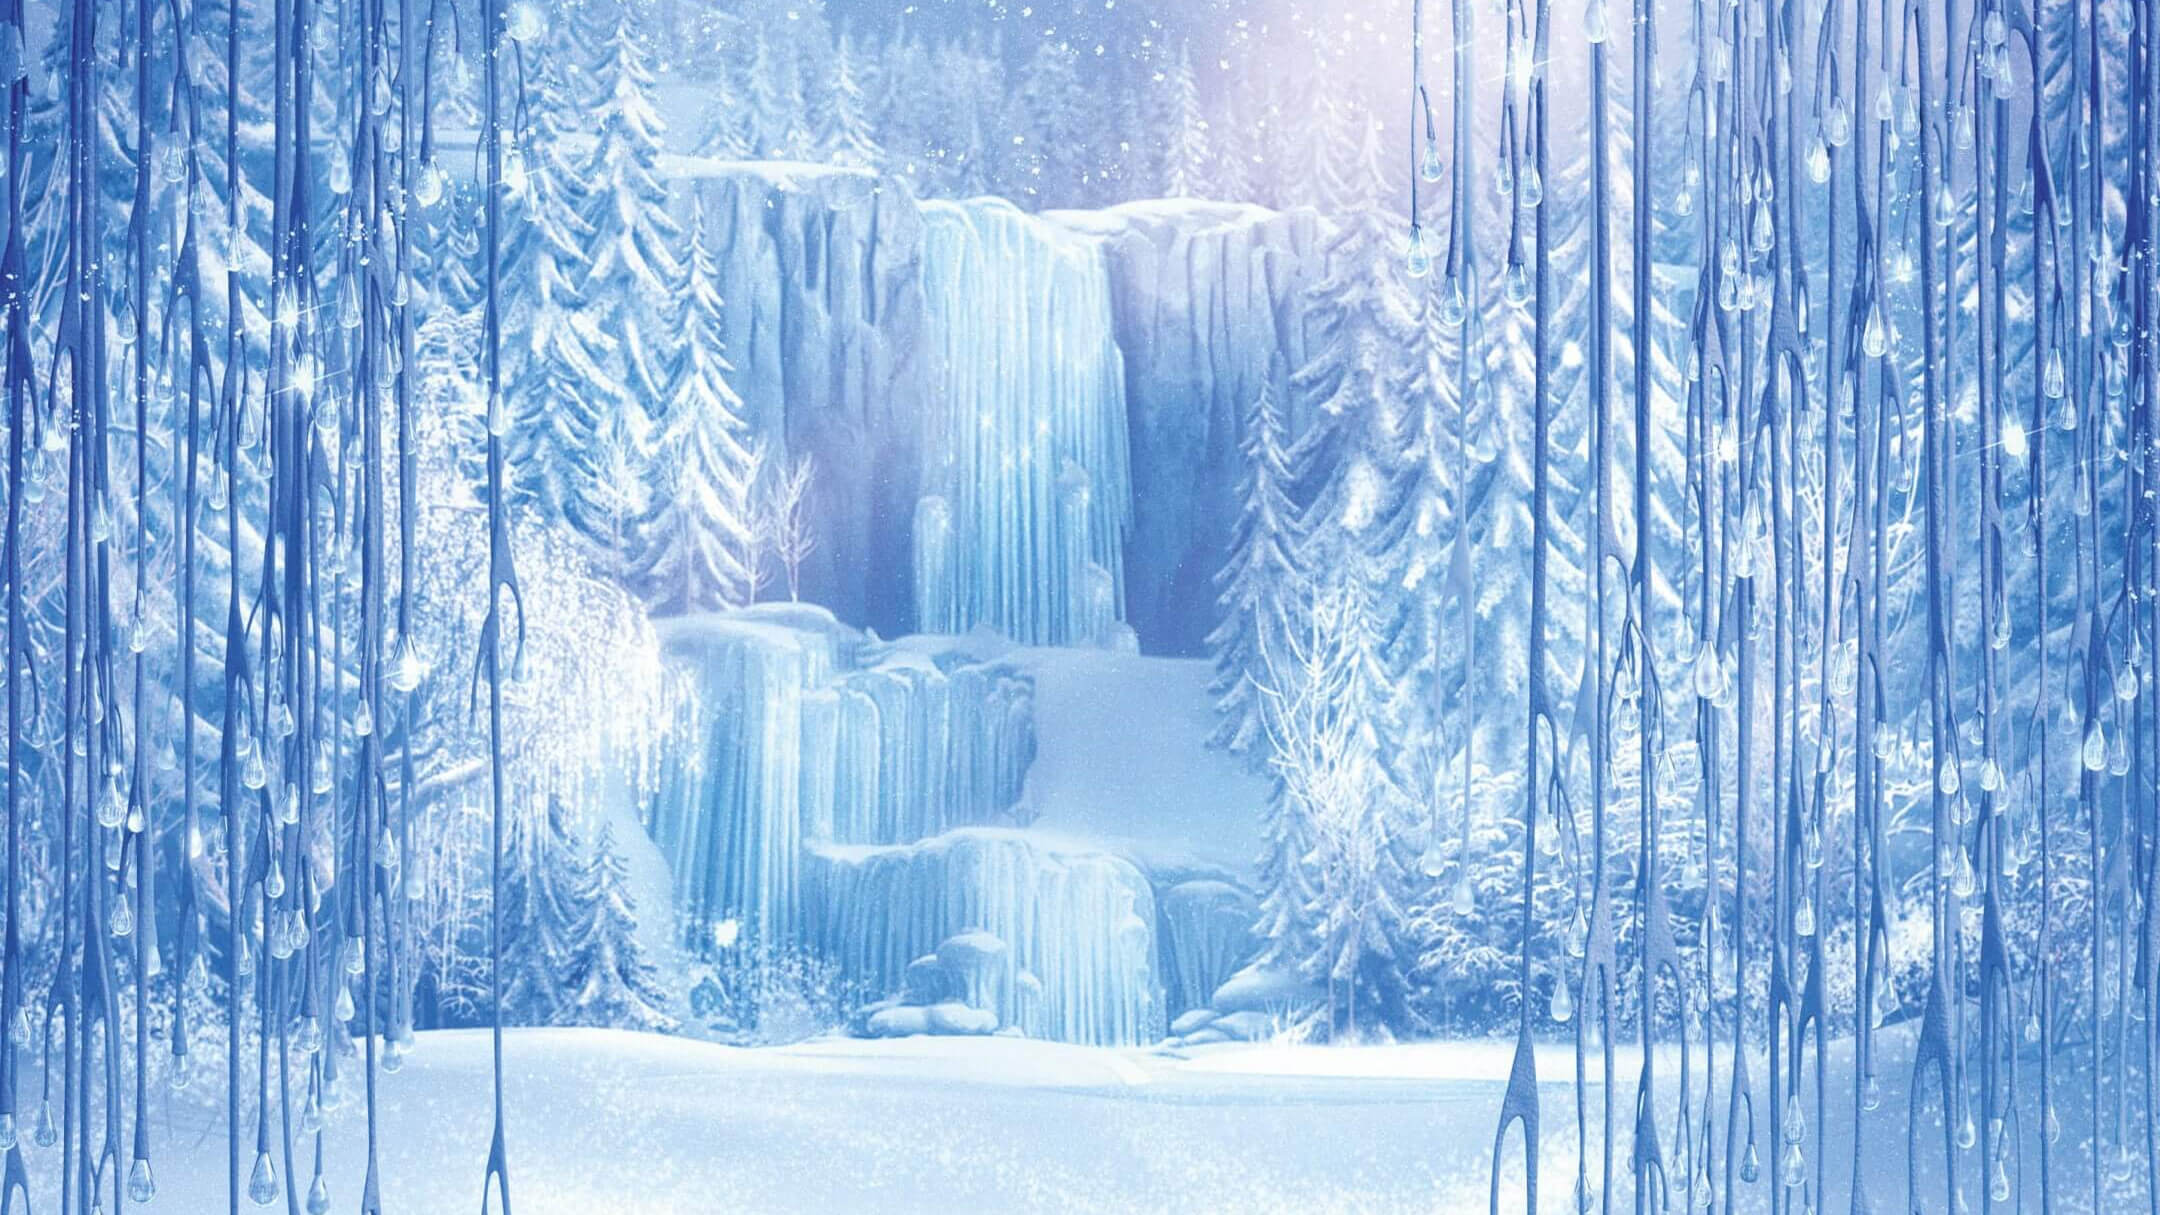 Freeze frozen